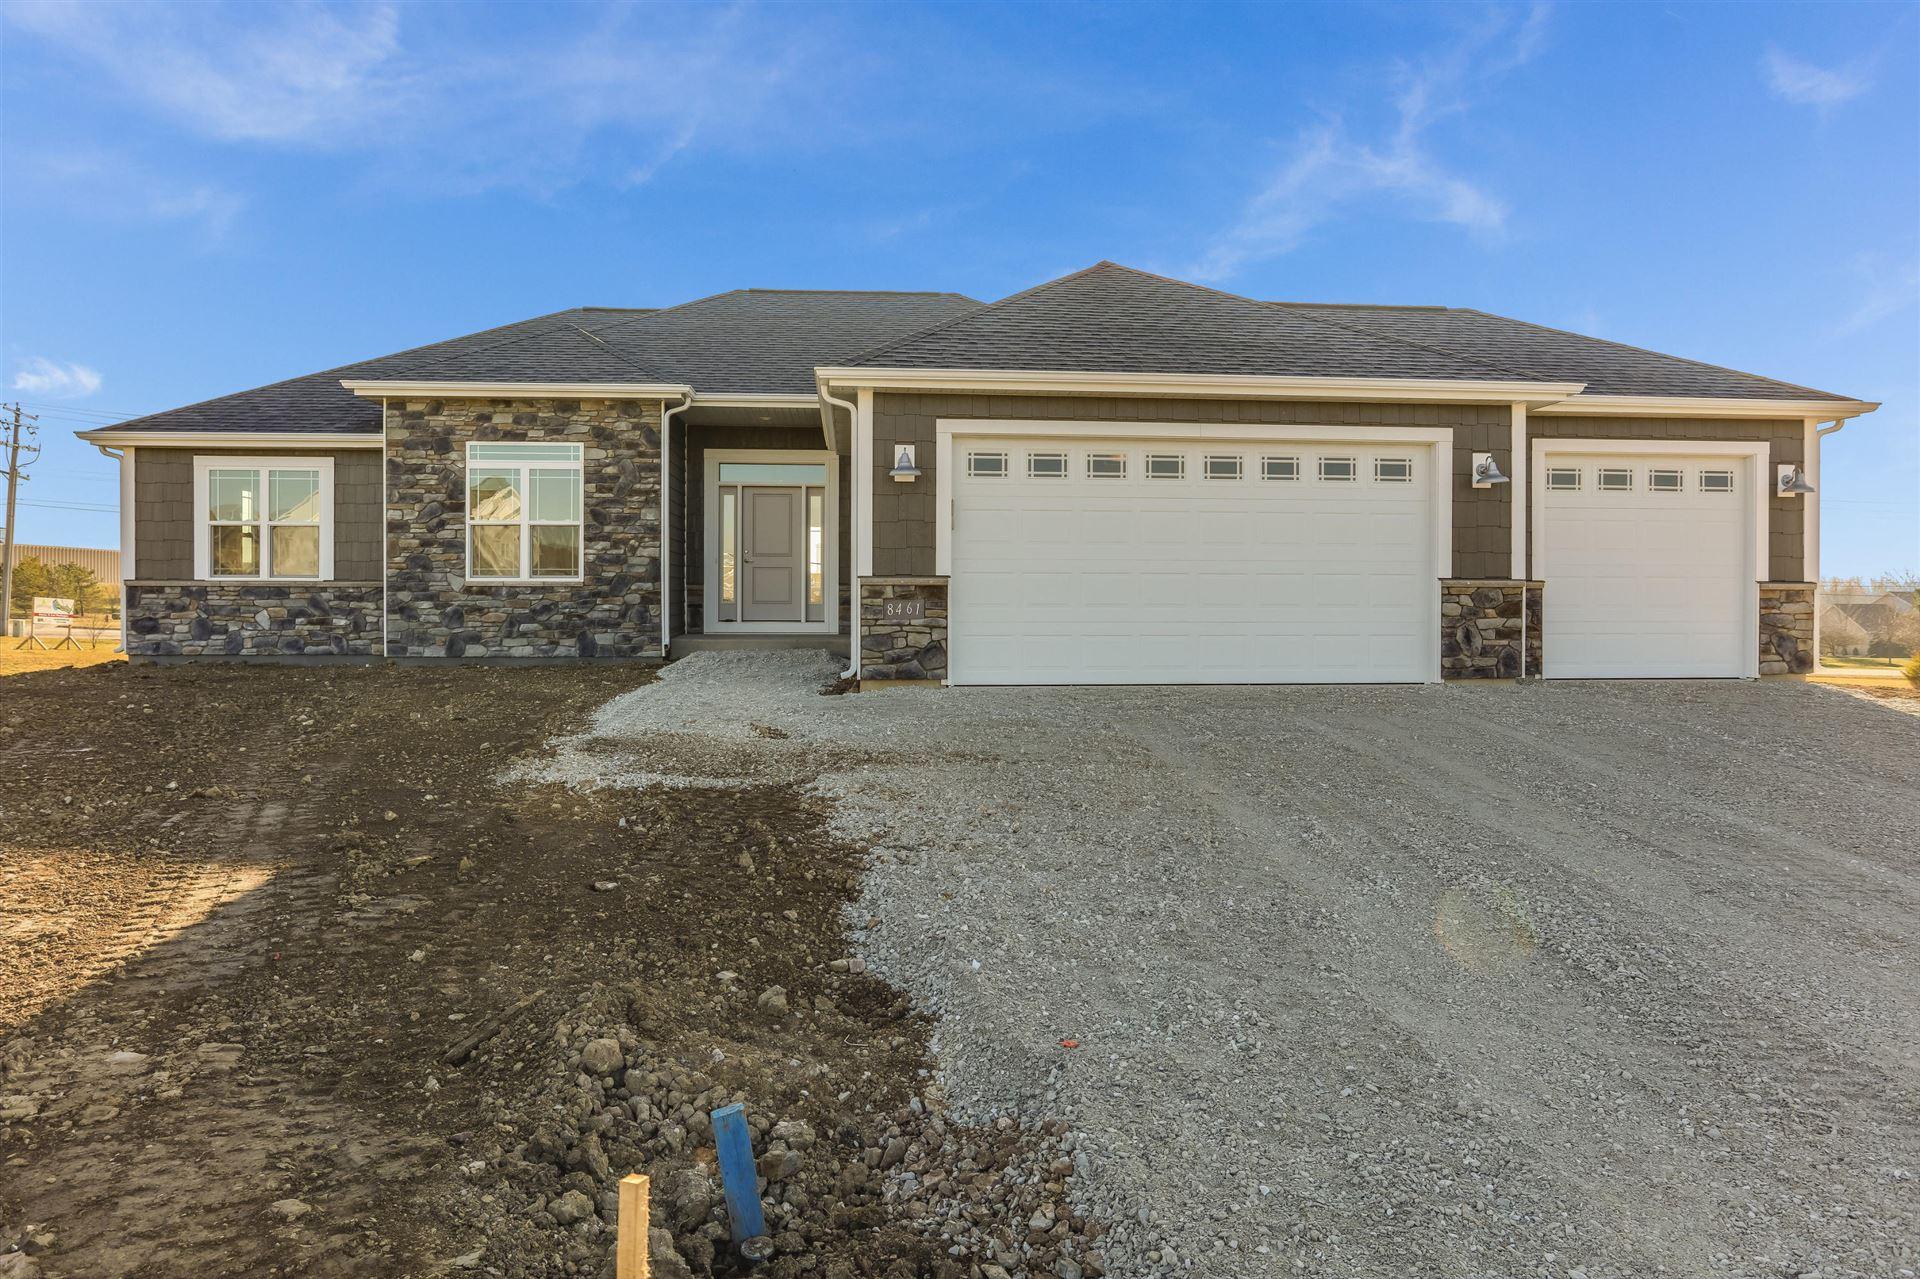 8461 Ridgeway Ct #Lt10, Pleasant Prairie, WI 53158 - #: 1707515